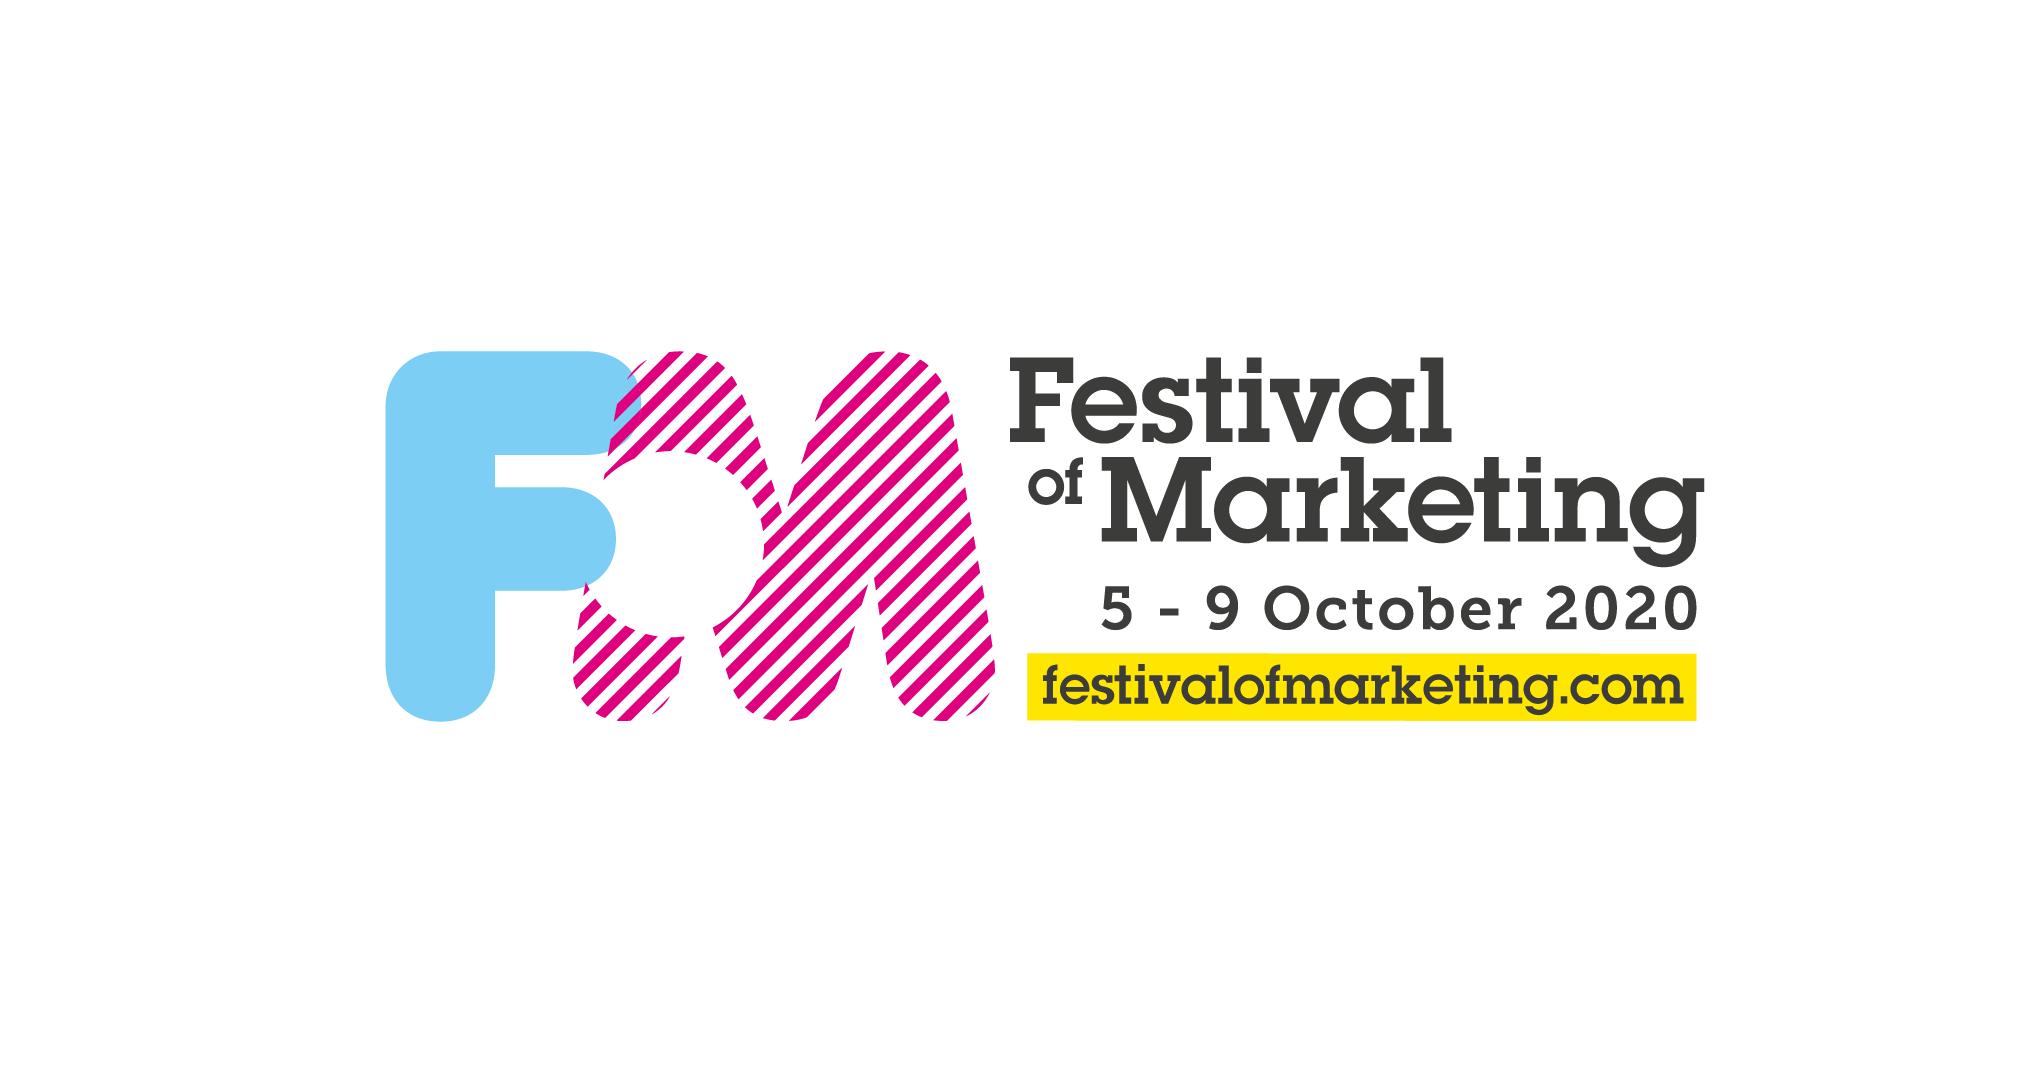 festival of marketing logo